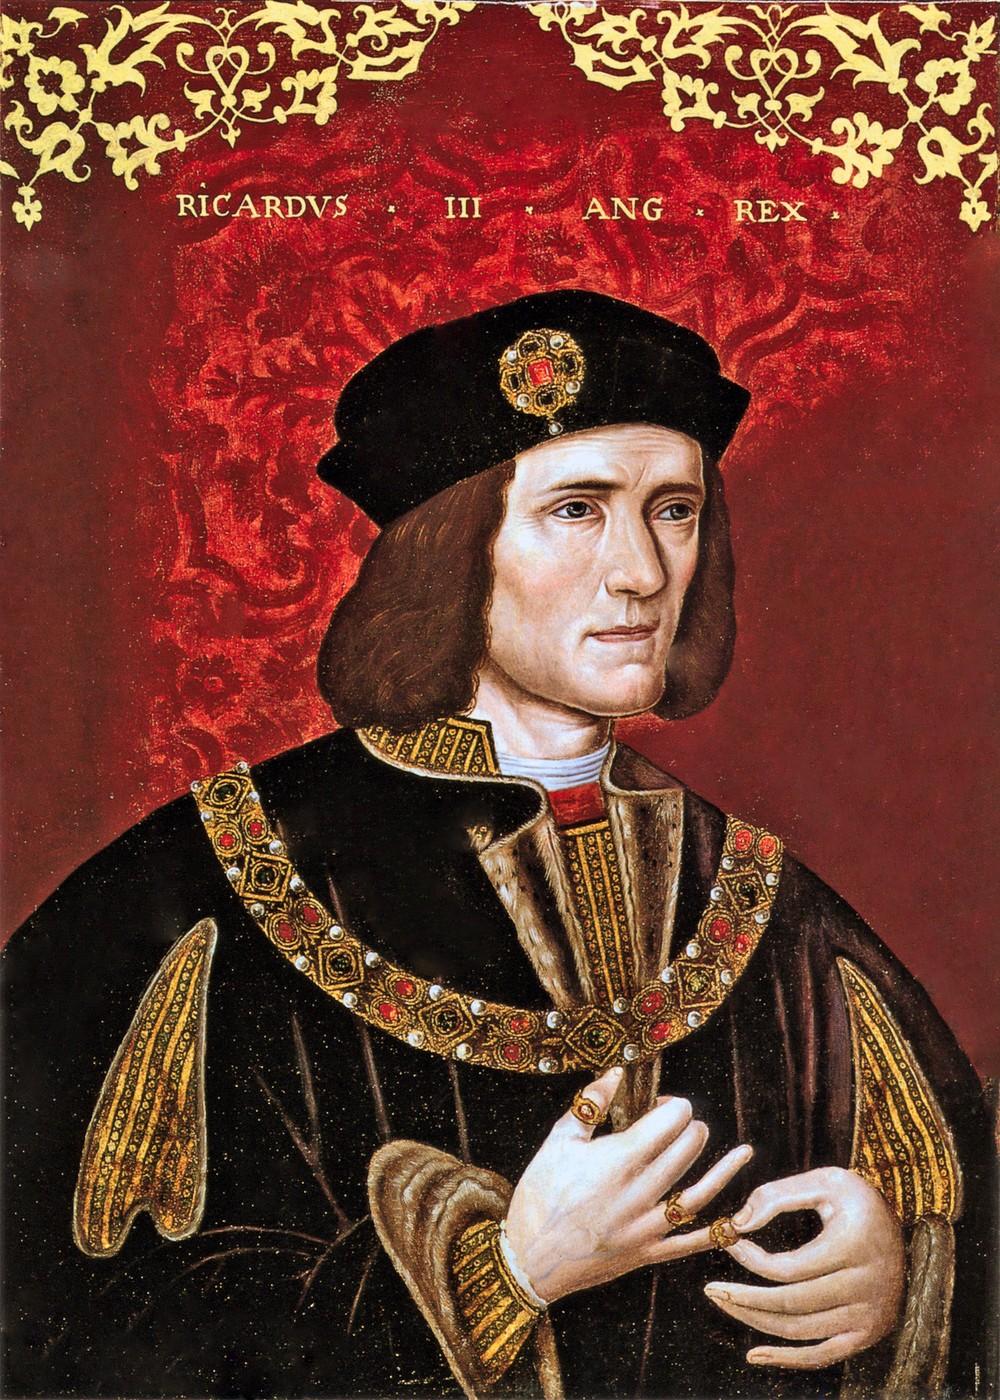 15 Year Boys Bedroom: 00 Unknown Artist. A Portrait Of King Richard III. Late